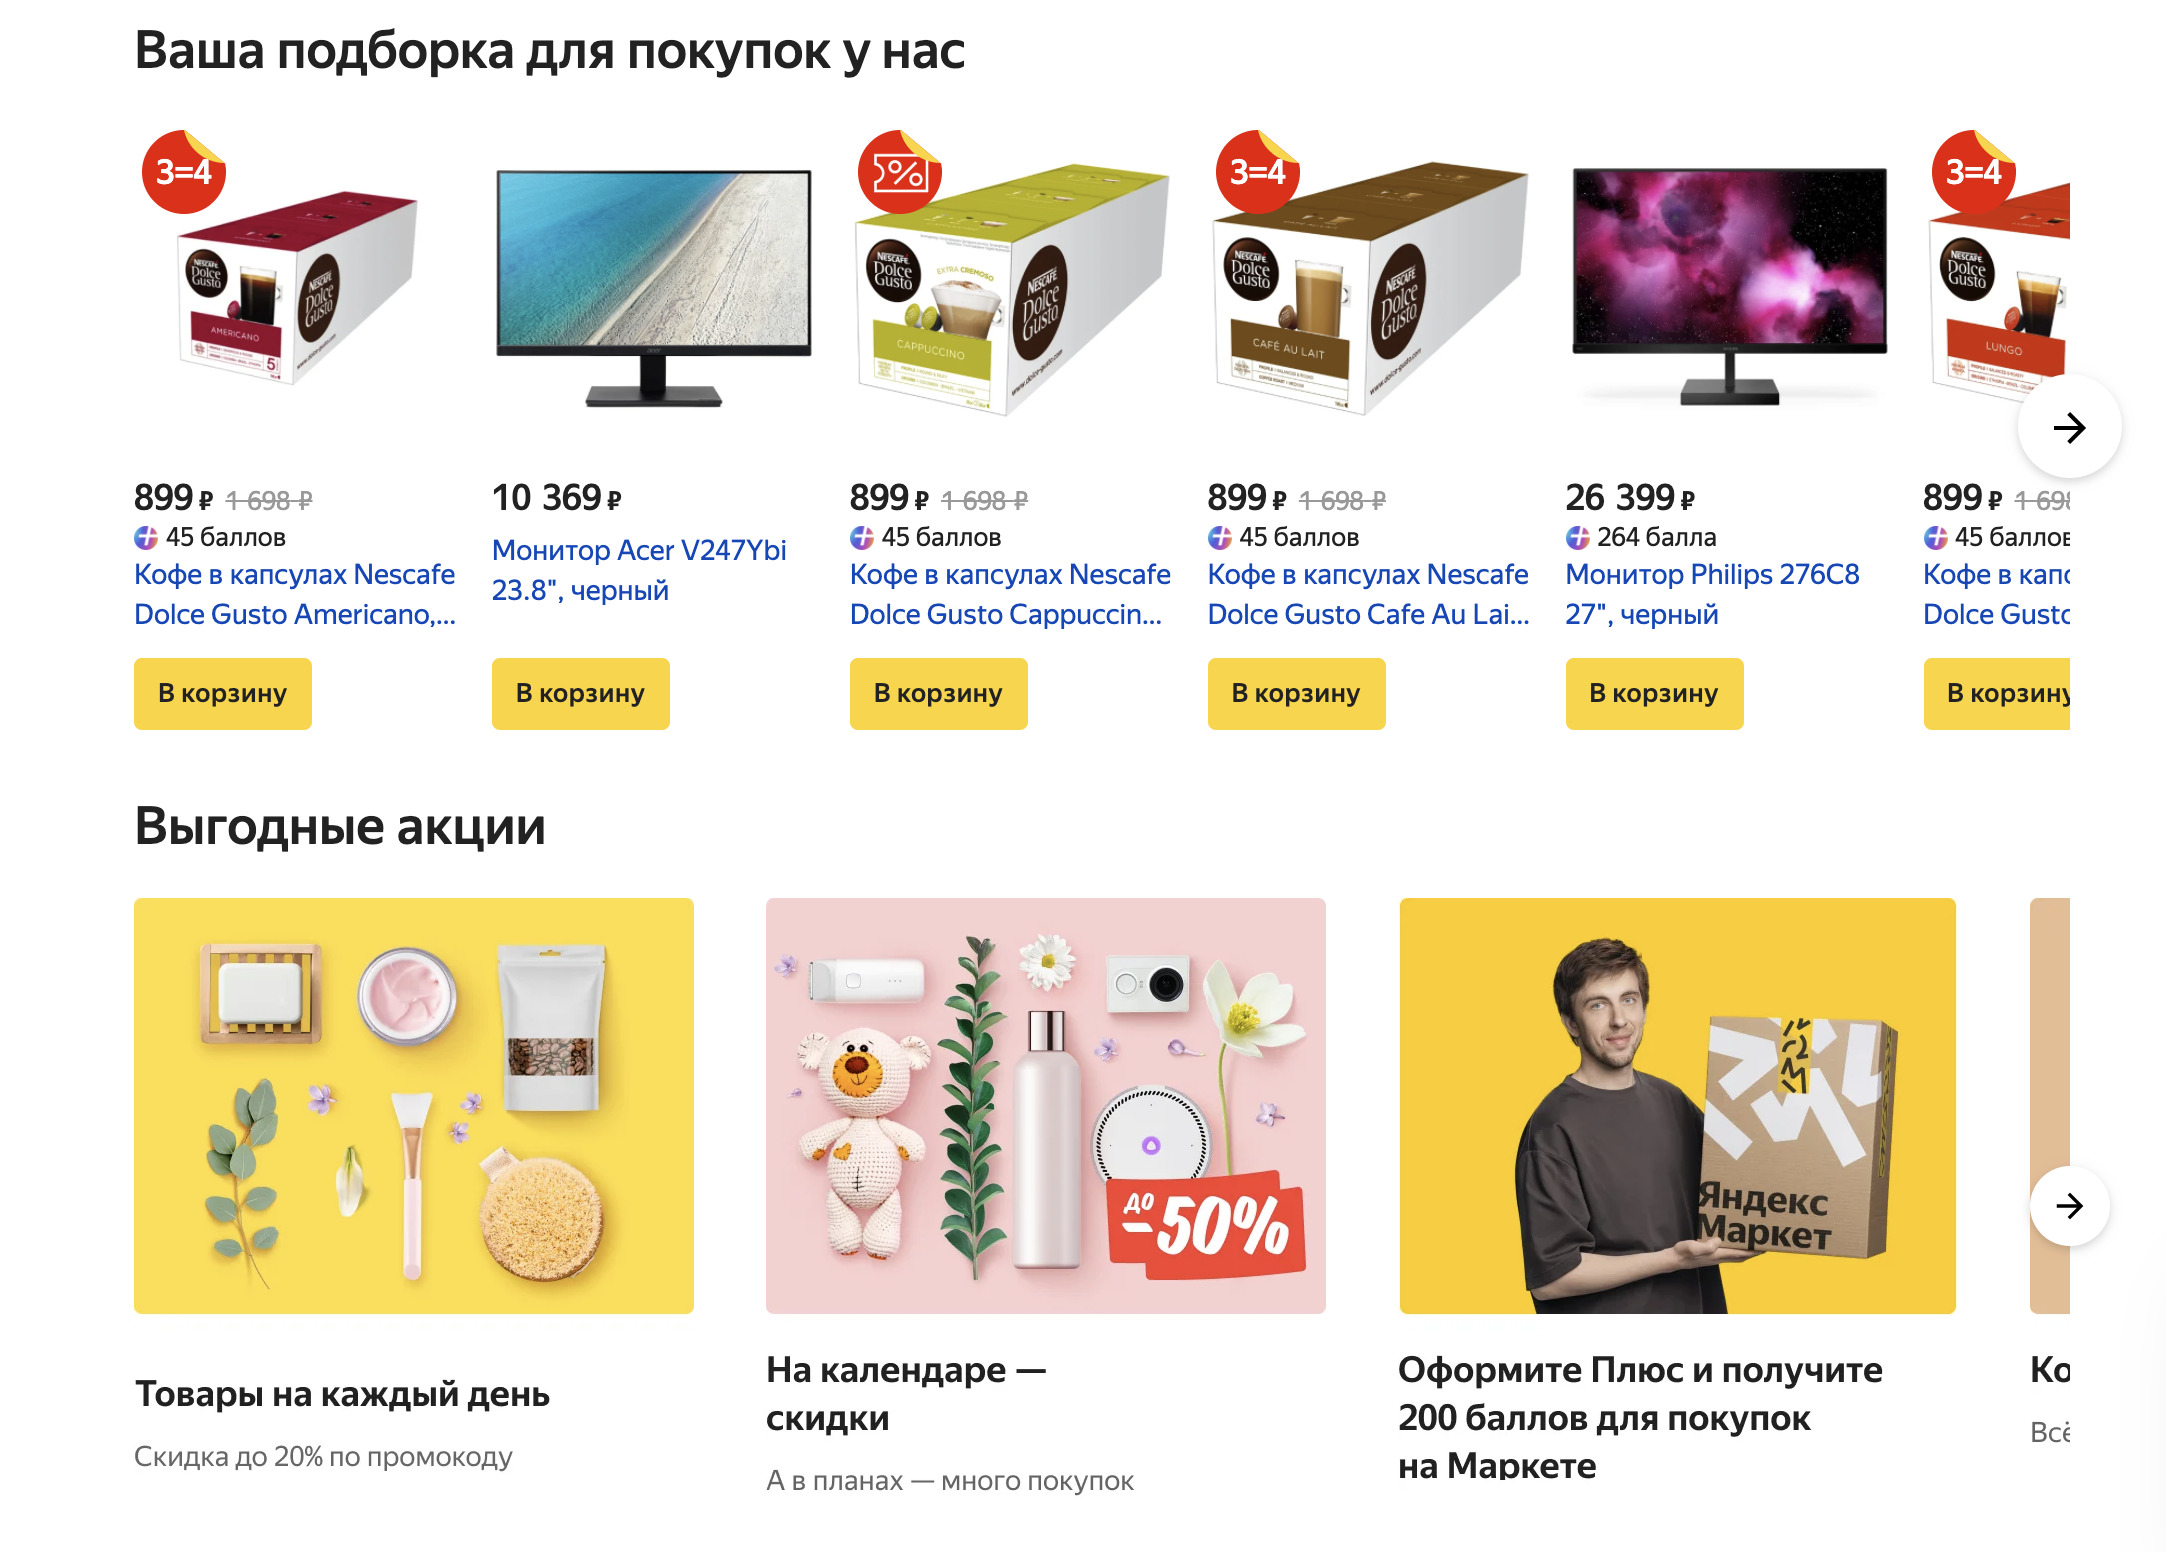 Доставка из Яндекс.Маркет в Наро-Фоминск, сроки, пункты выдачи, каталог